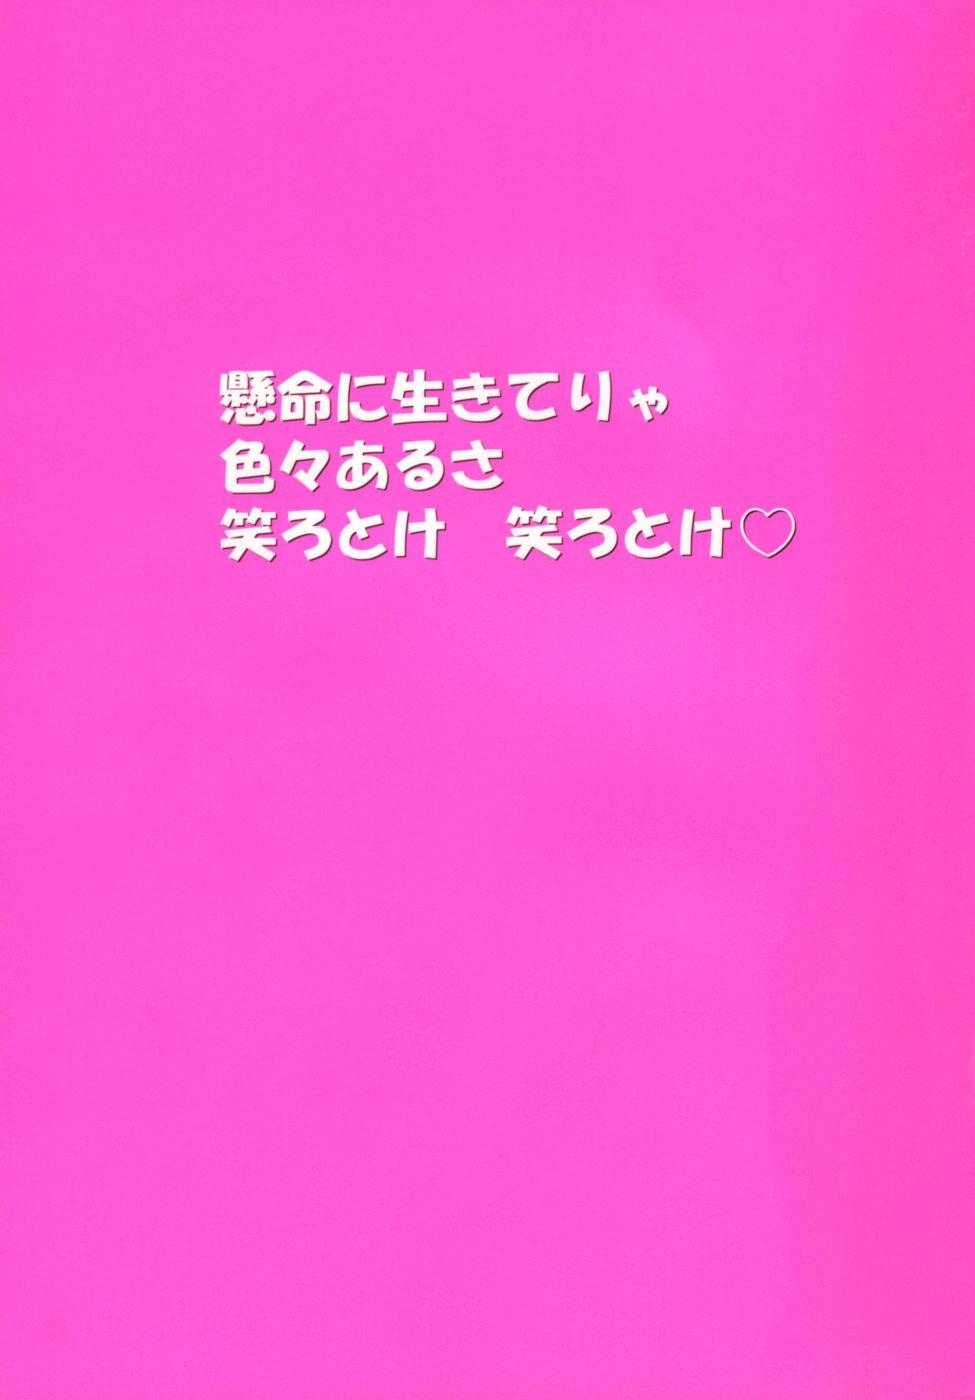 Shining Musume. 5. Five Sense of Love 5